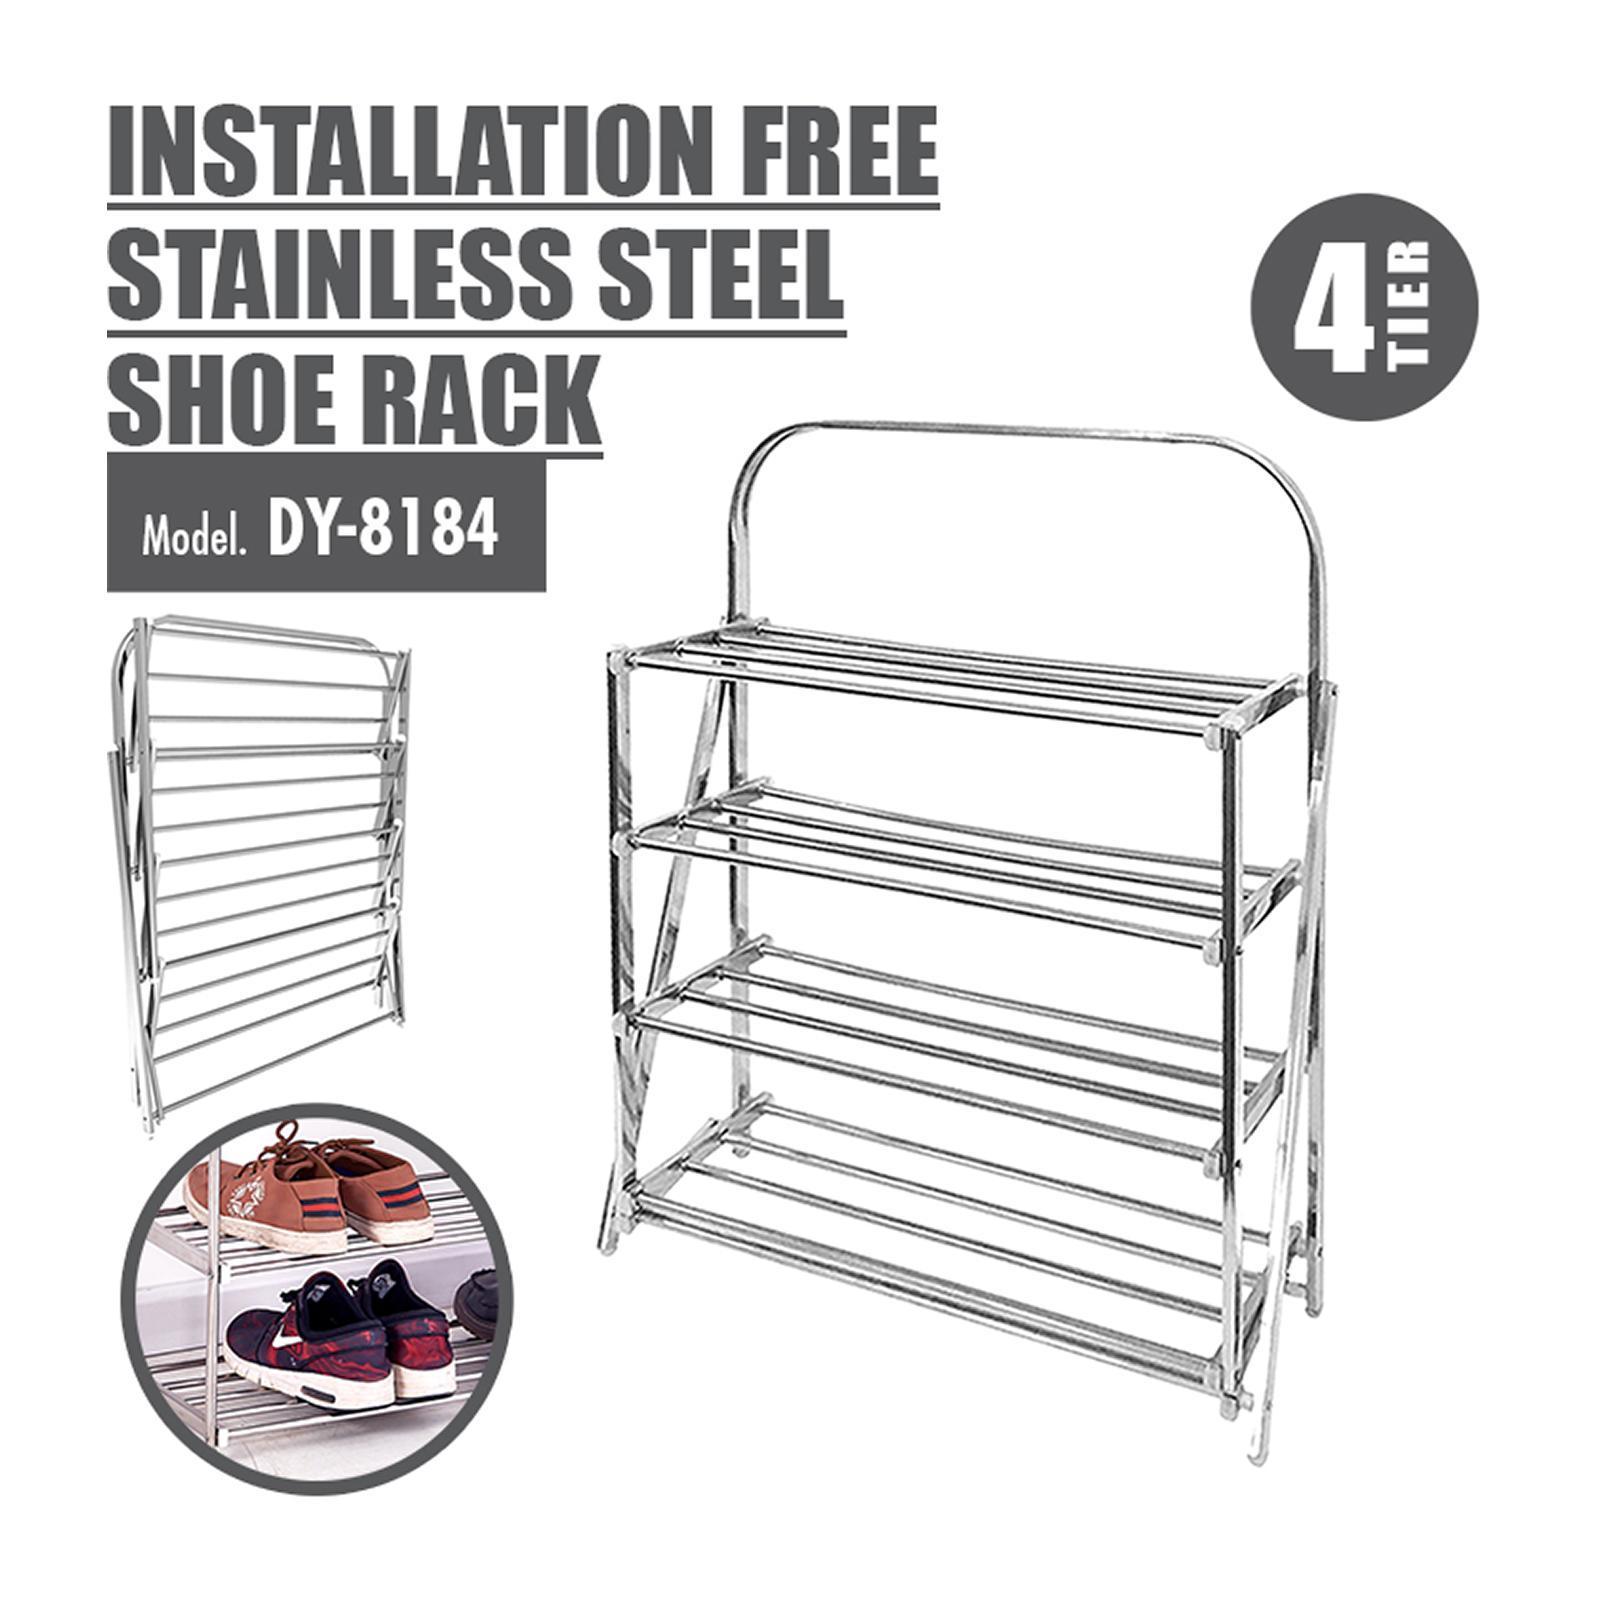 HOUZE 4 Tier Installation Free Stainless Steel Shoe Rack